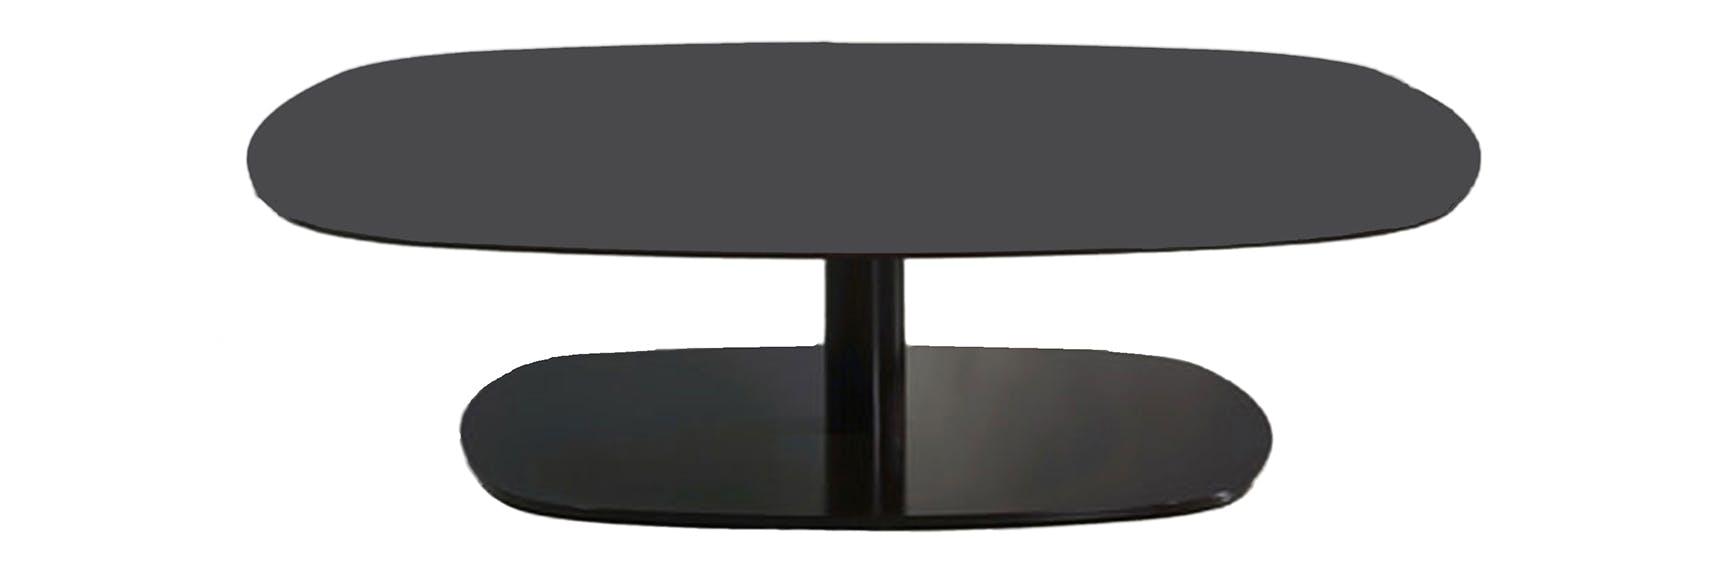 Kek Coffee Table 3